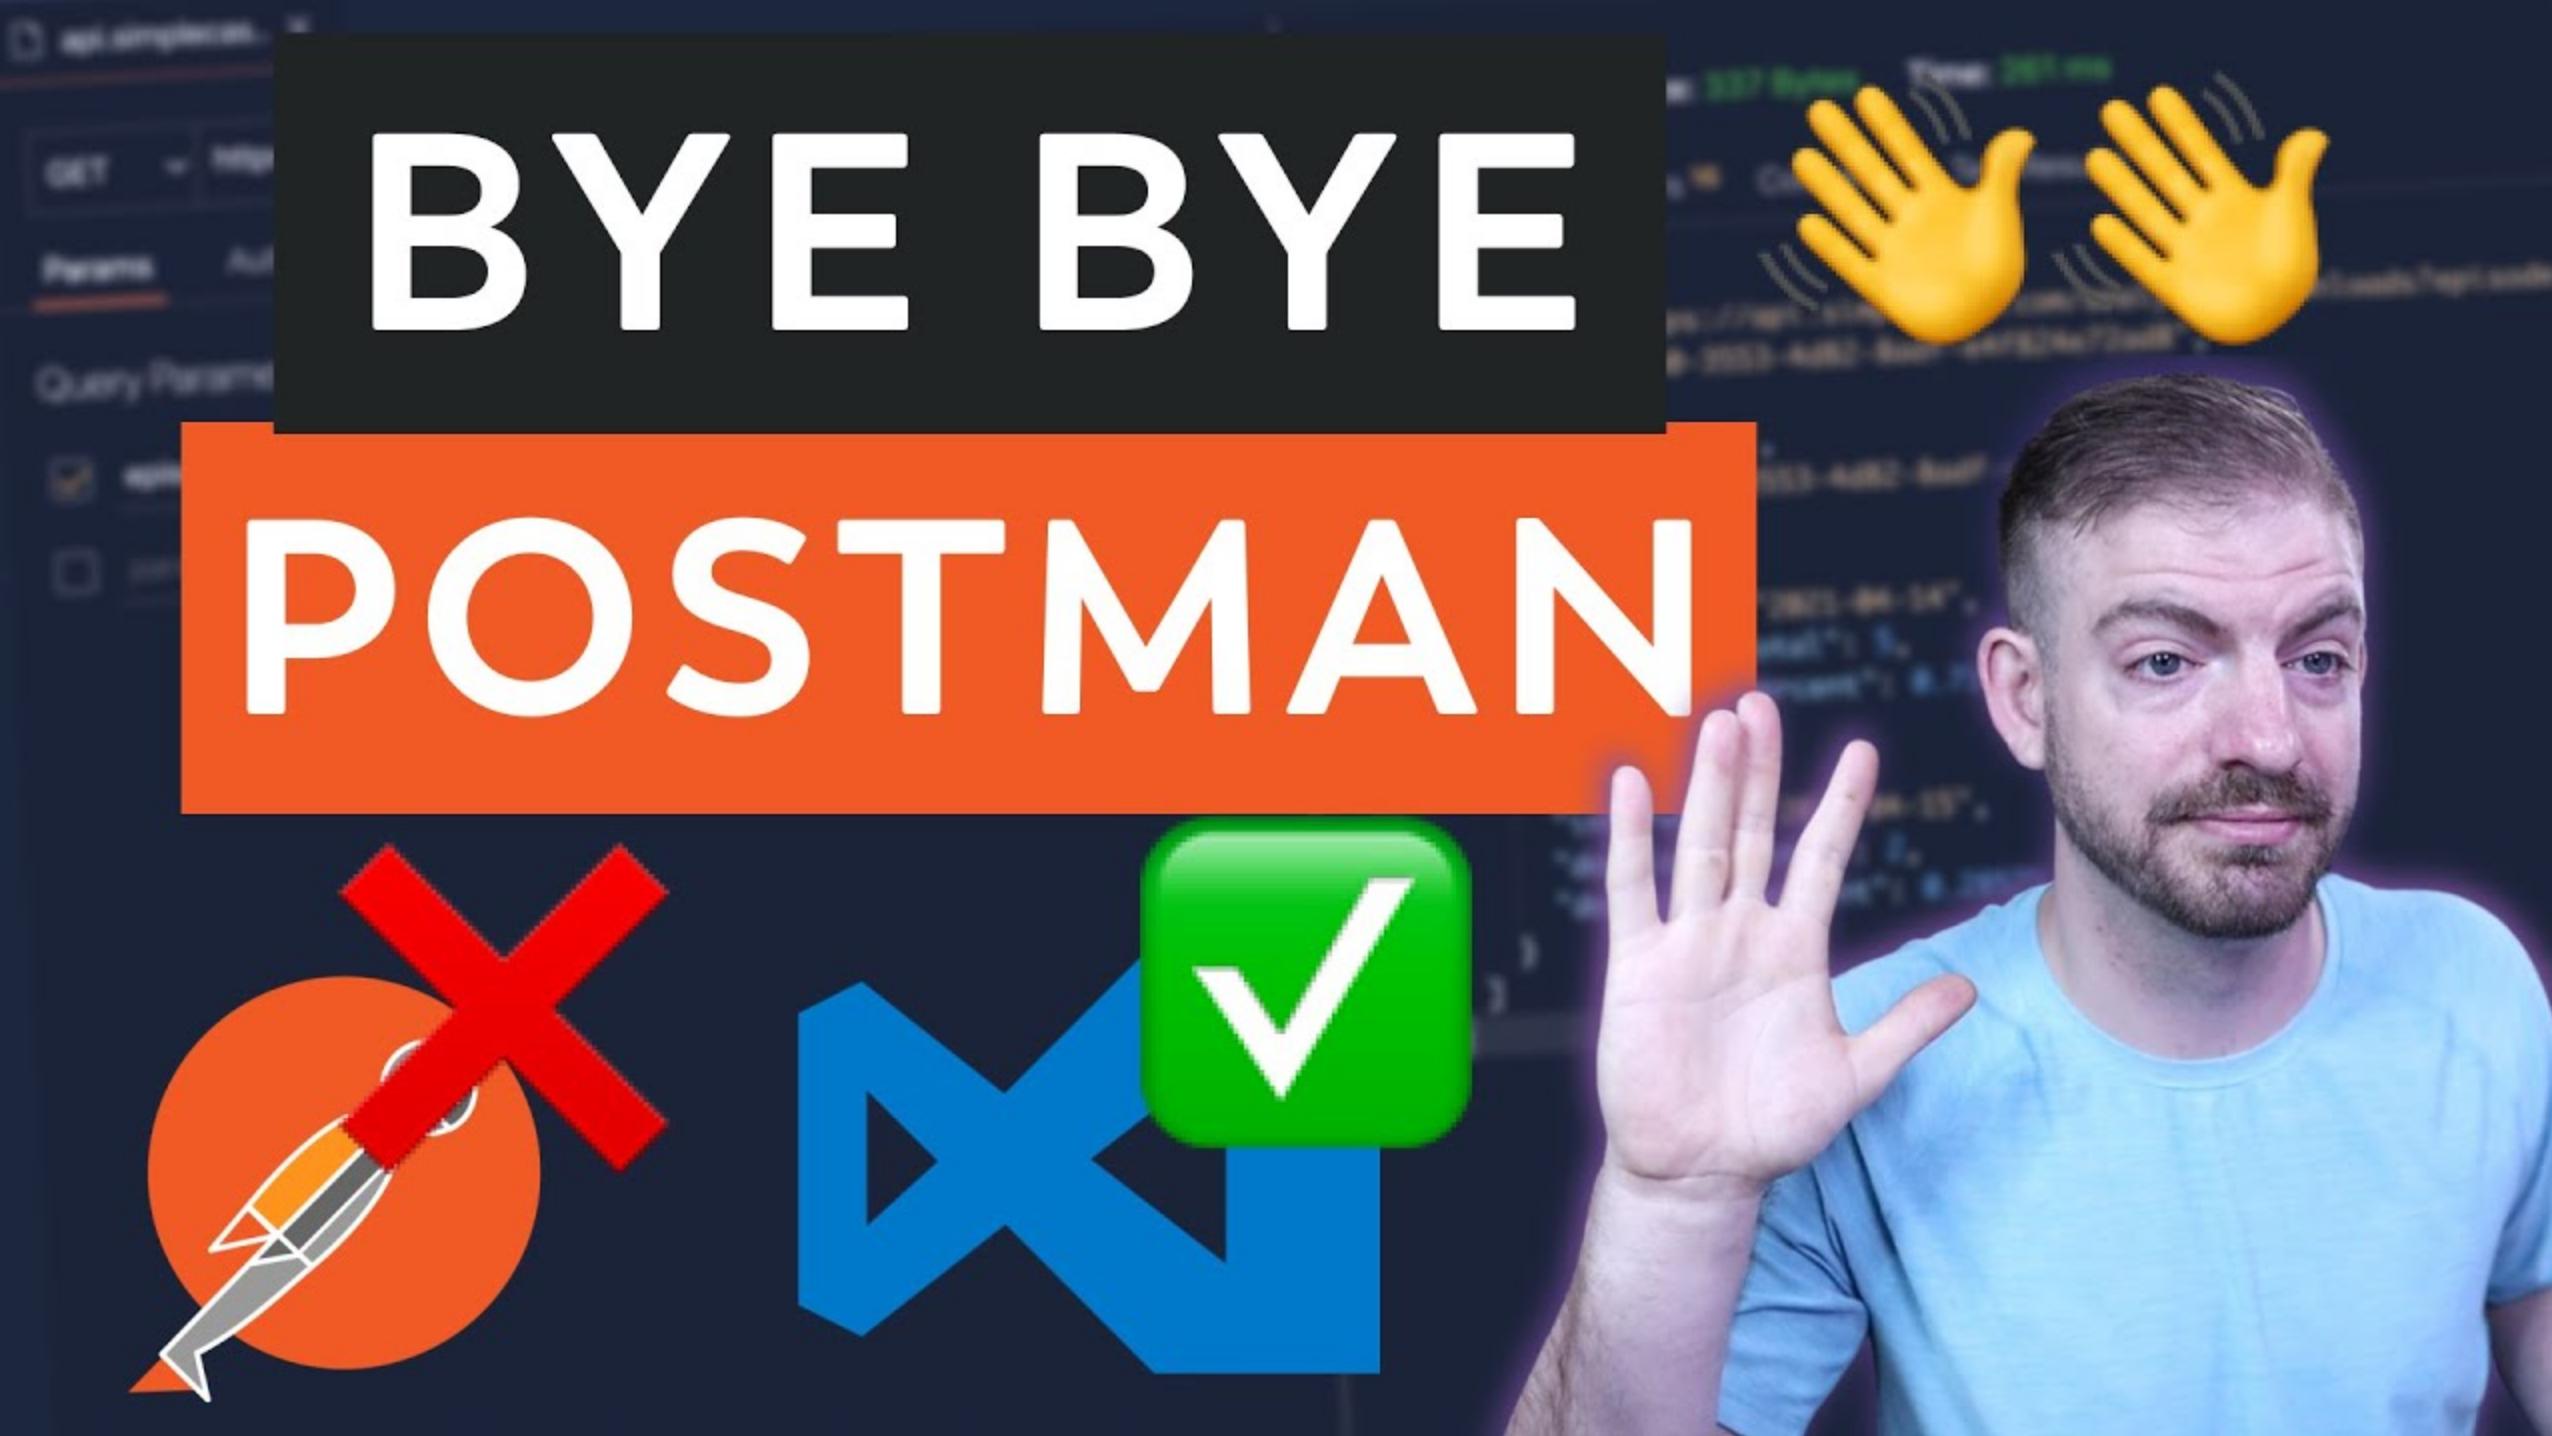 I Don't Need Postman